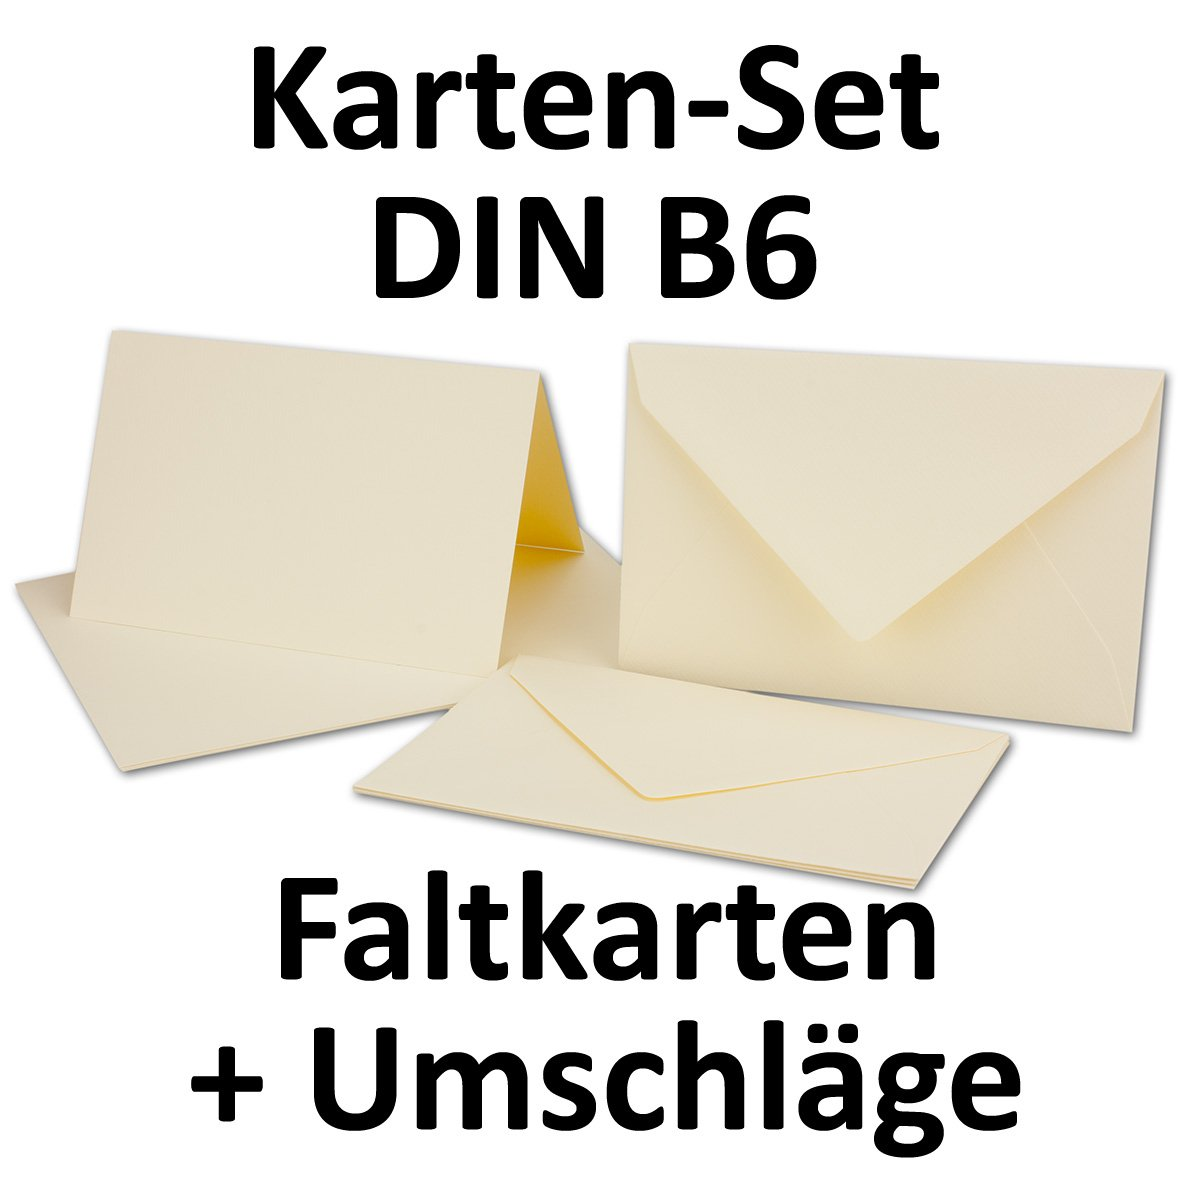 Tarjeta del paquete/plegable Tarjetas/Sobres DIN B6 en en en crema Chamois//acanalados., color Creme-Chamois 100 Sets 056d9d